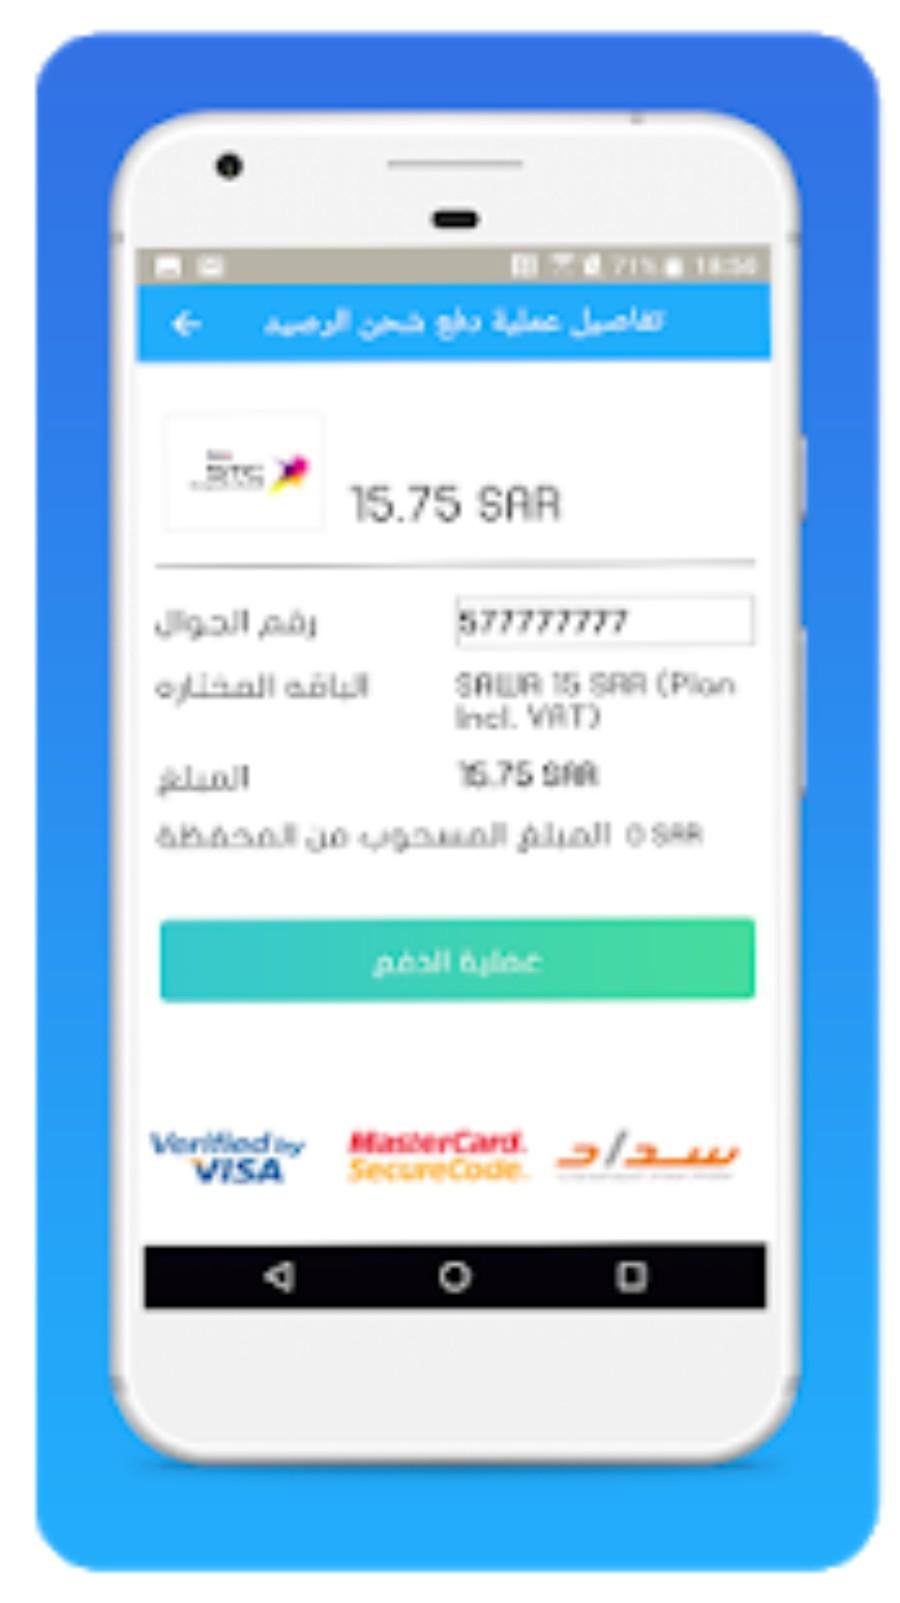 3.webp  1 - تطبيق سددلي saddly لشحن جوالك ومزايا اخرى بدون ما تروح لأي مكان وتشتري بطاقة شحن